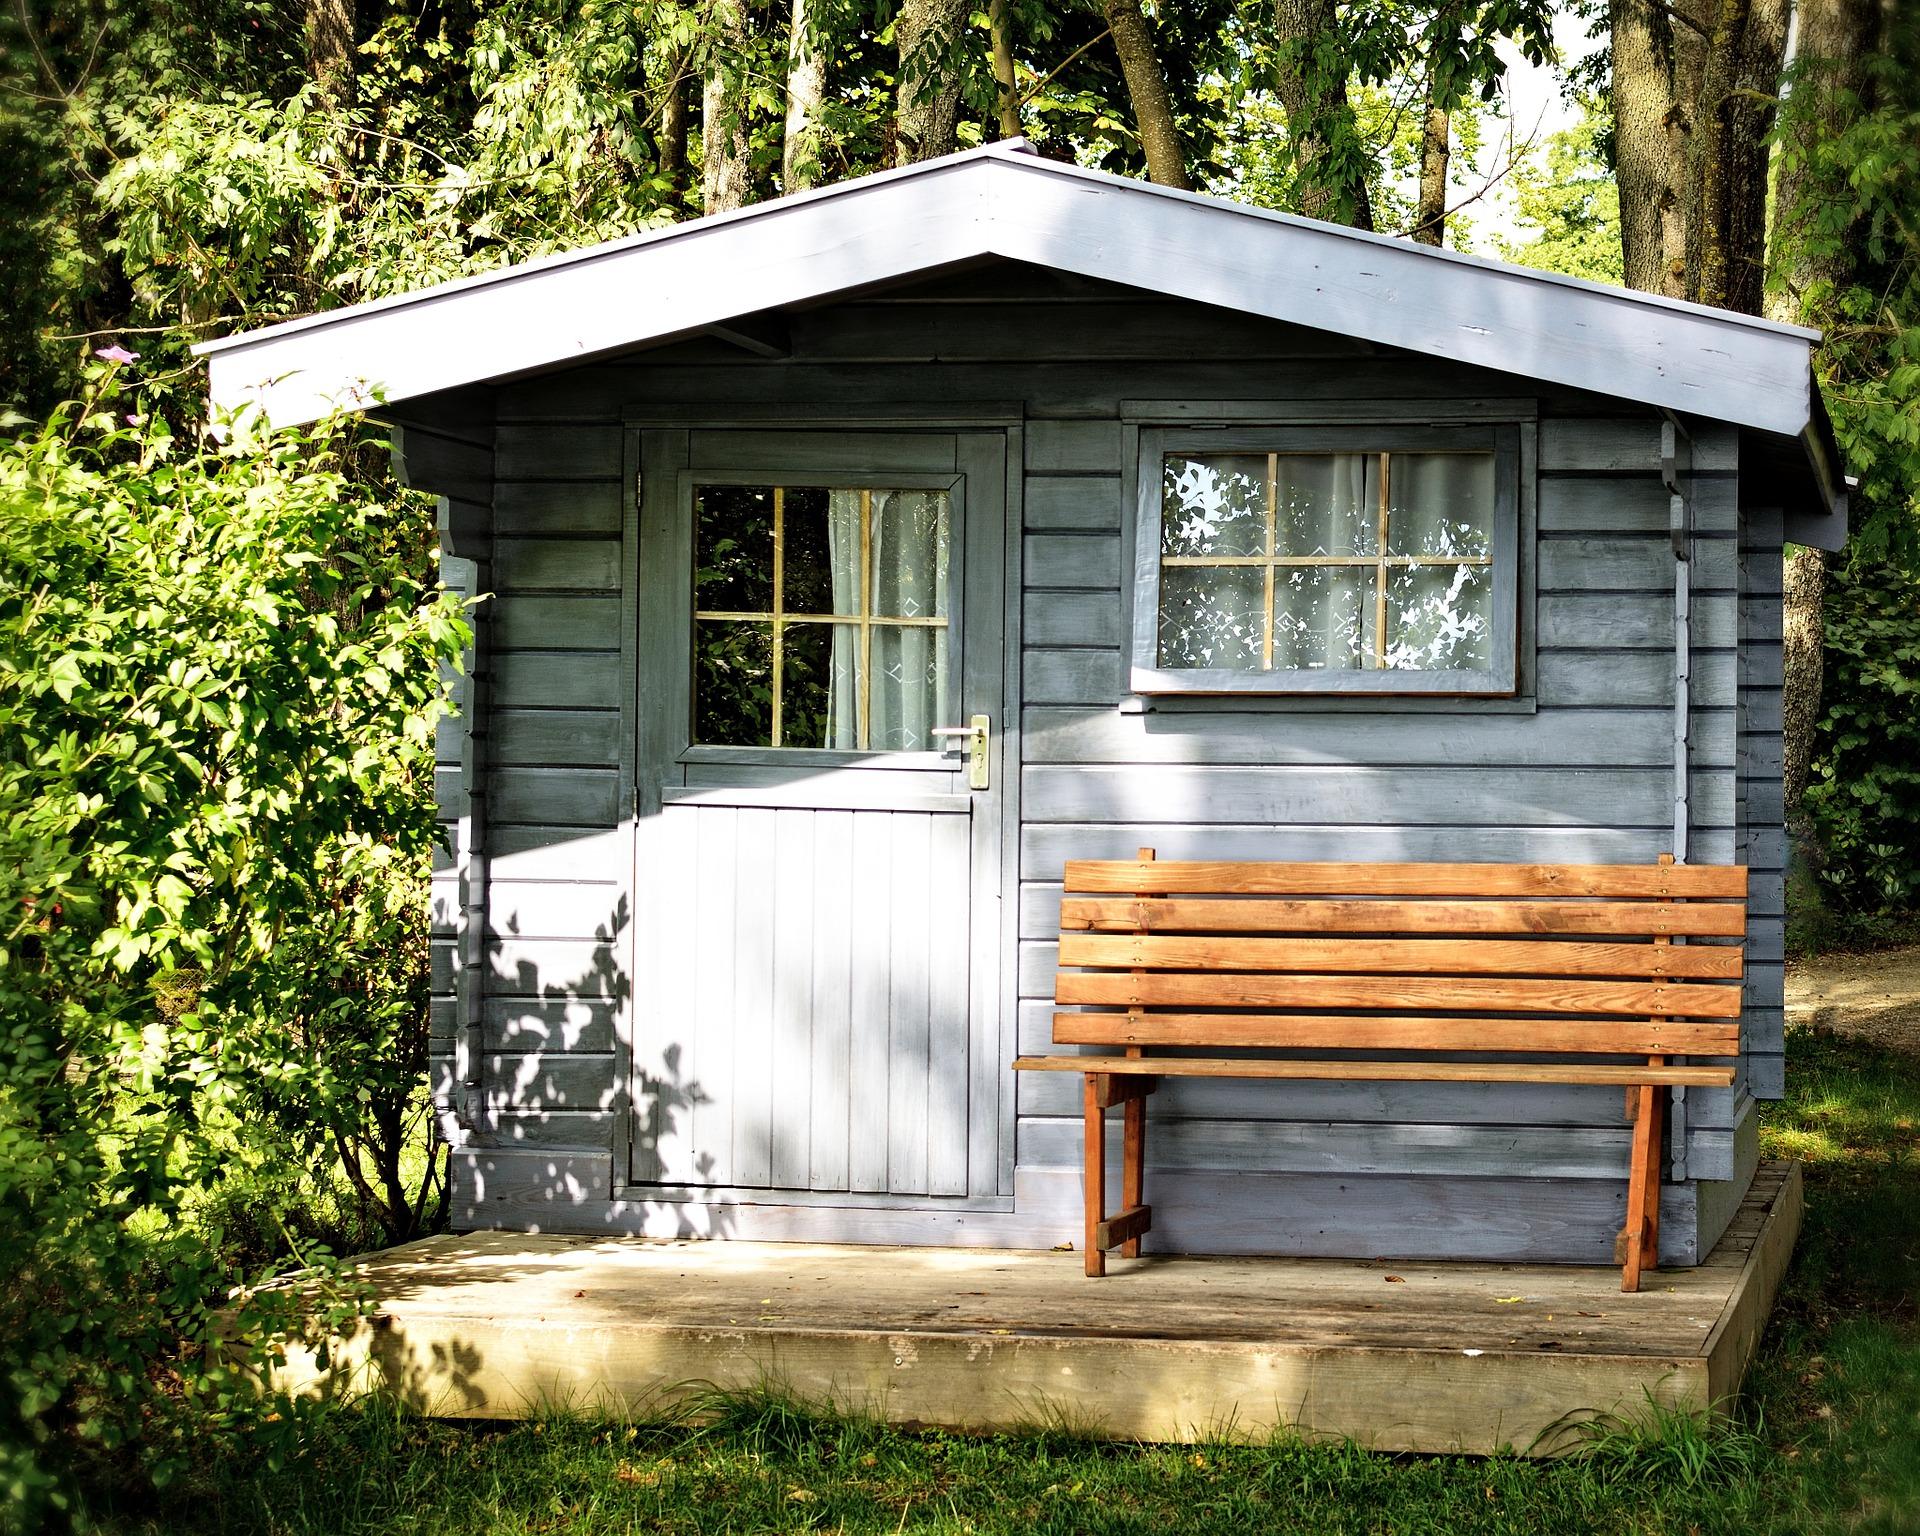 Shed roofing materials which is right for you edecks blog - Abris de jardin en bois castorama ...